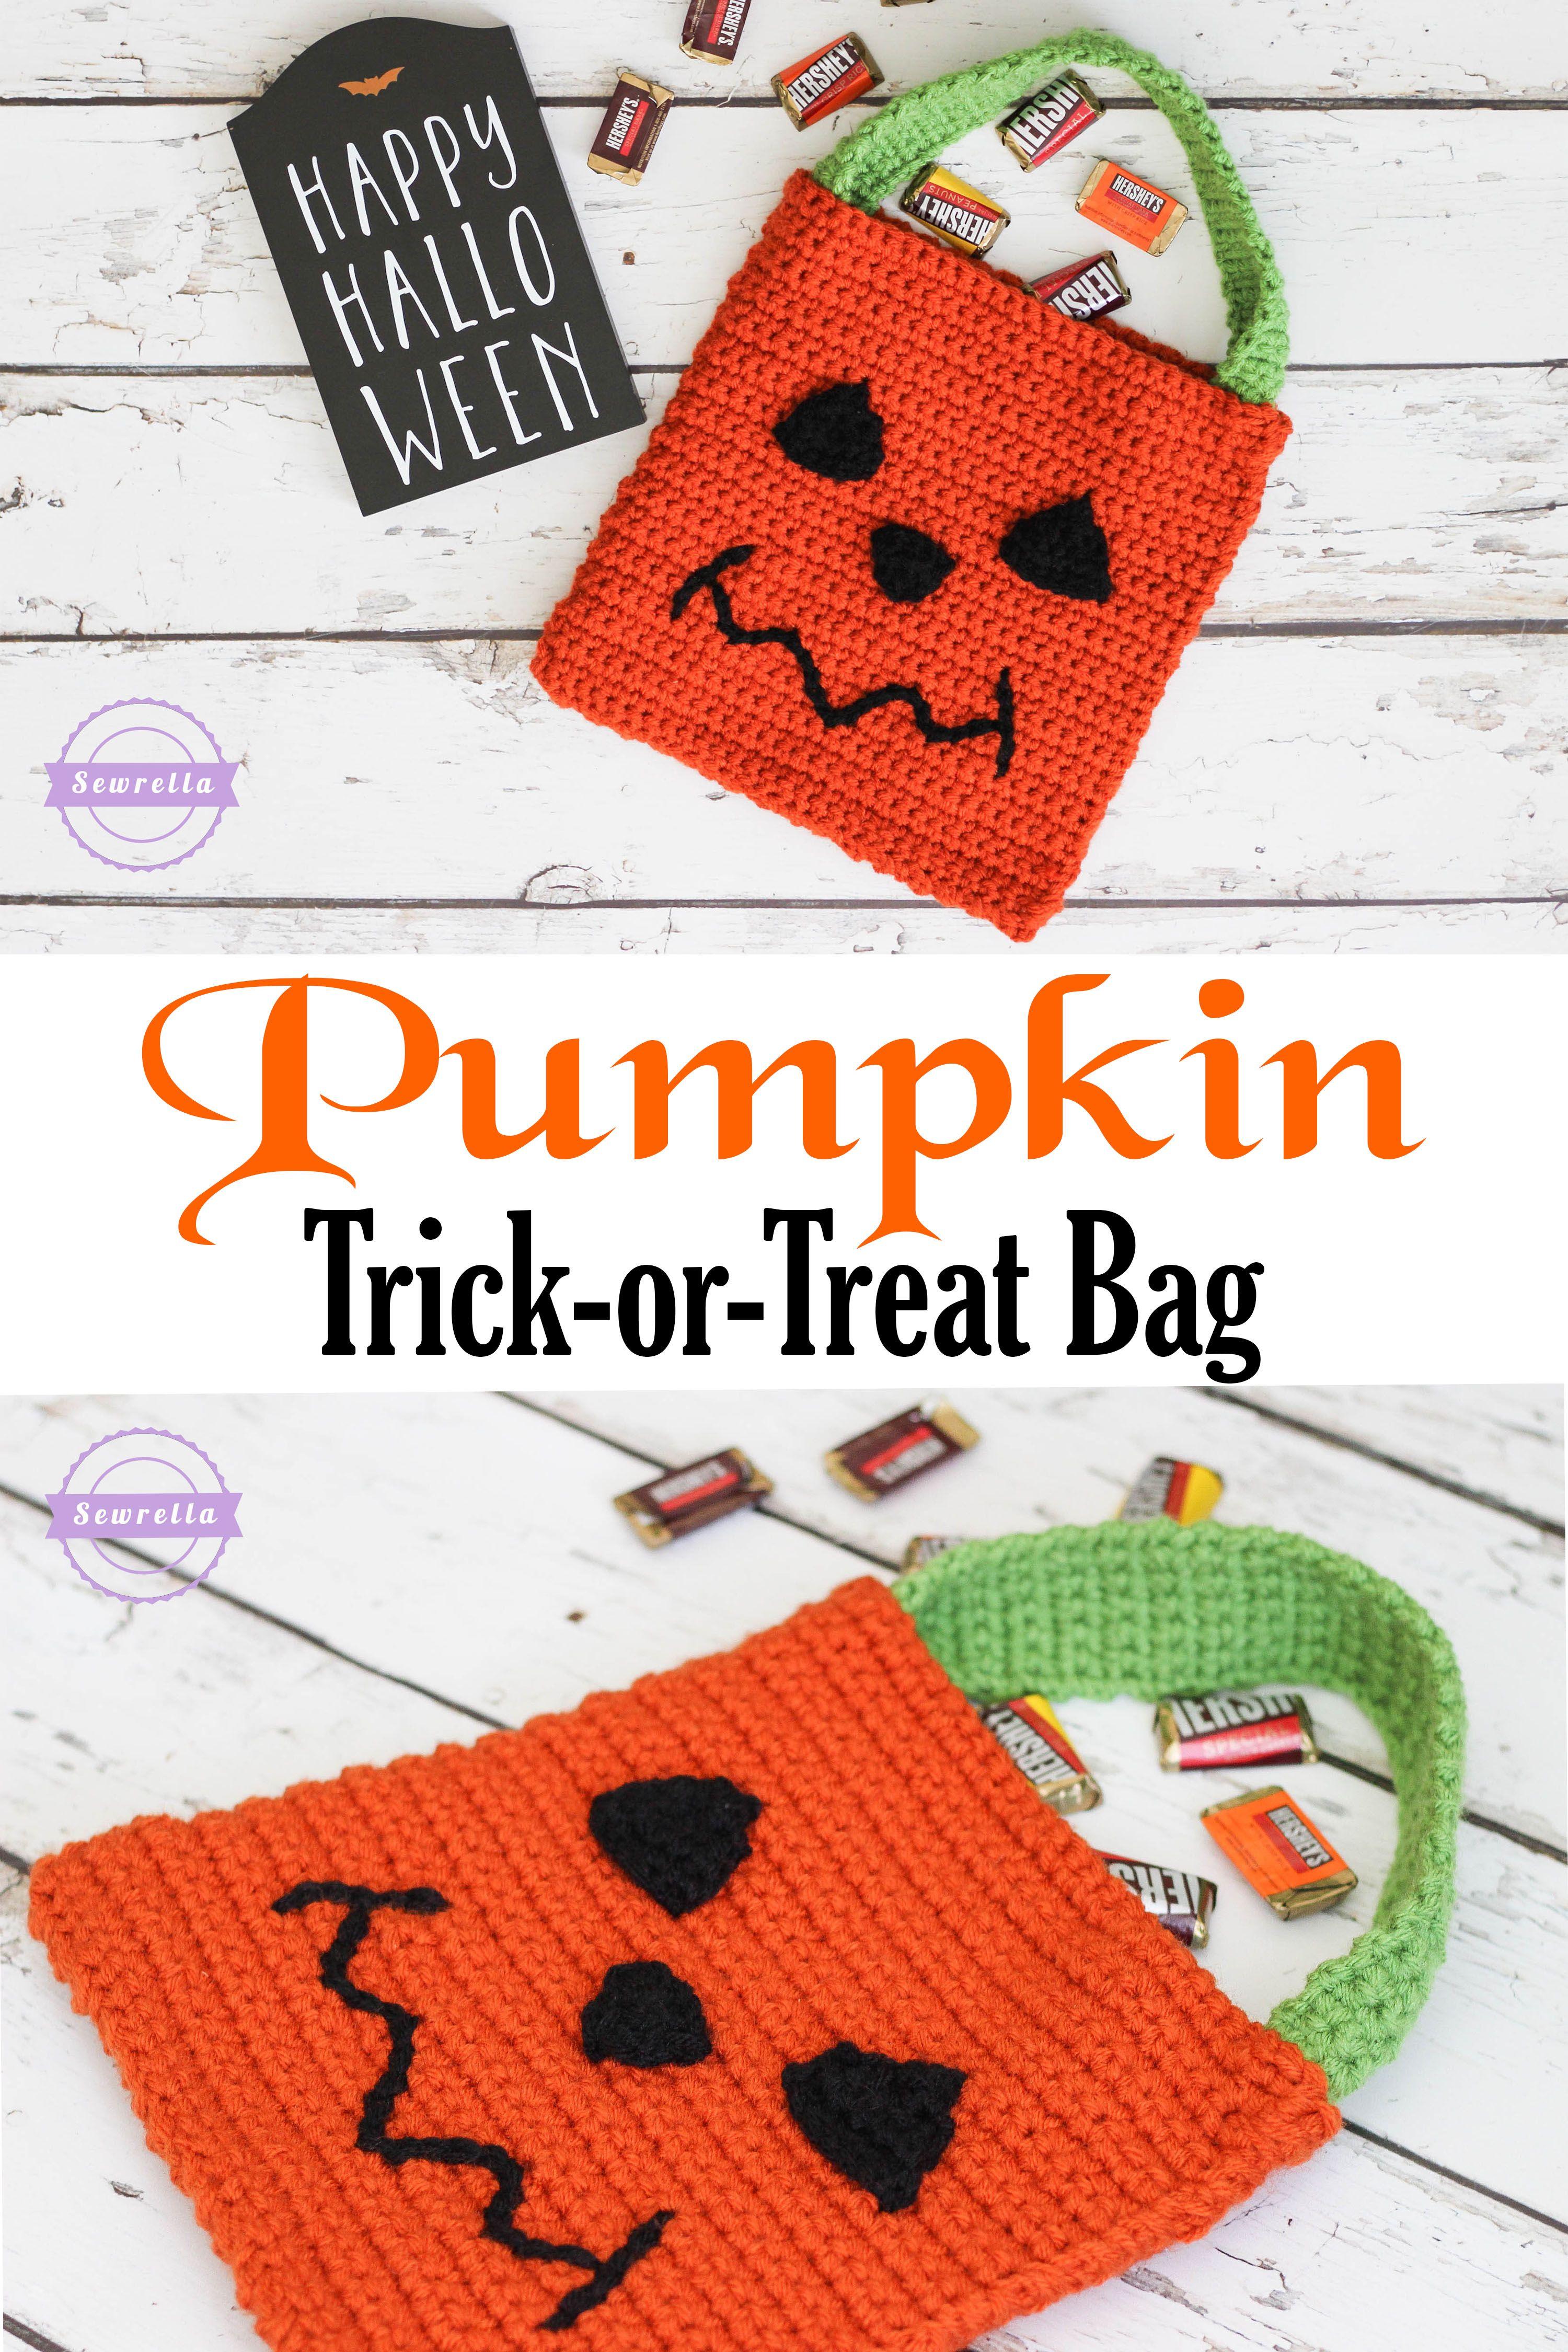 Crochet Pumpkin Trick Or Treat Bag Whoot Best Crochet And Knitting